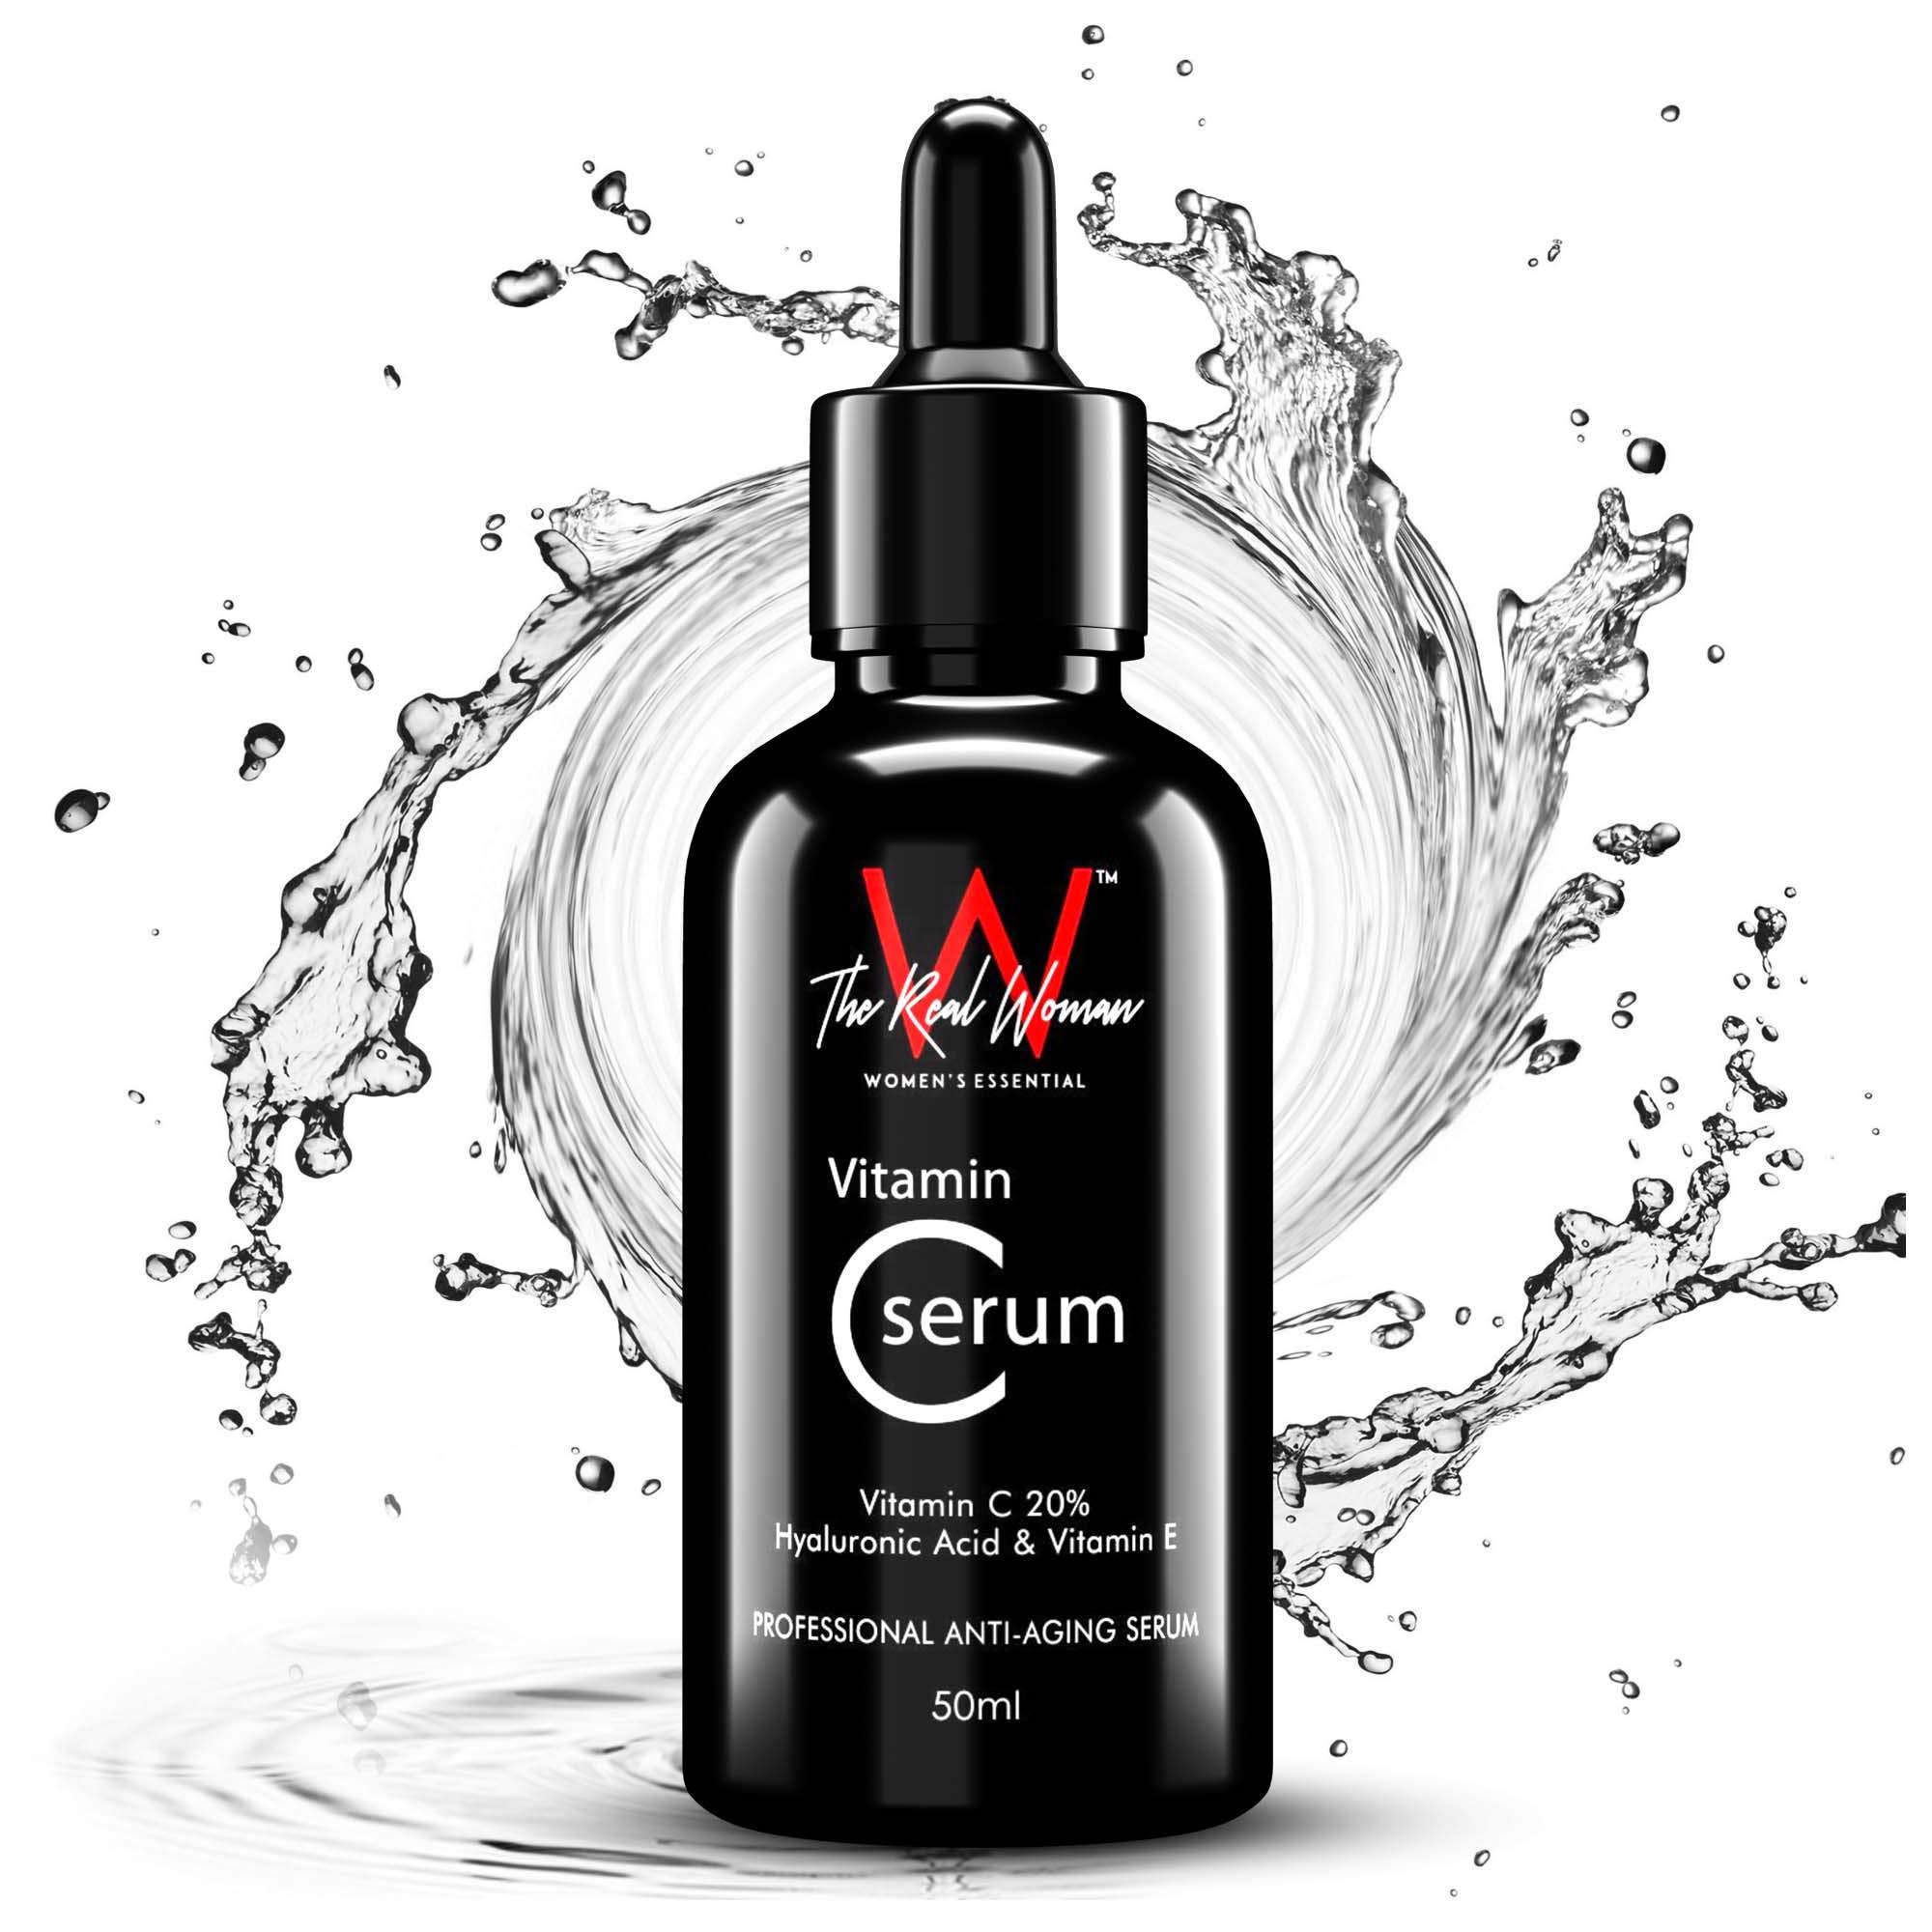 THE REAL WOMAN Professional Anti-Aging Vitamin C Serum 50ml. Vitamin C 20% + Hyaluronic Acid & Vitamin E. Under Eye Dark Circles, Anti Aging, Skin Fairness & Brightening. (PACK OF 1) product image